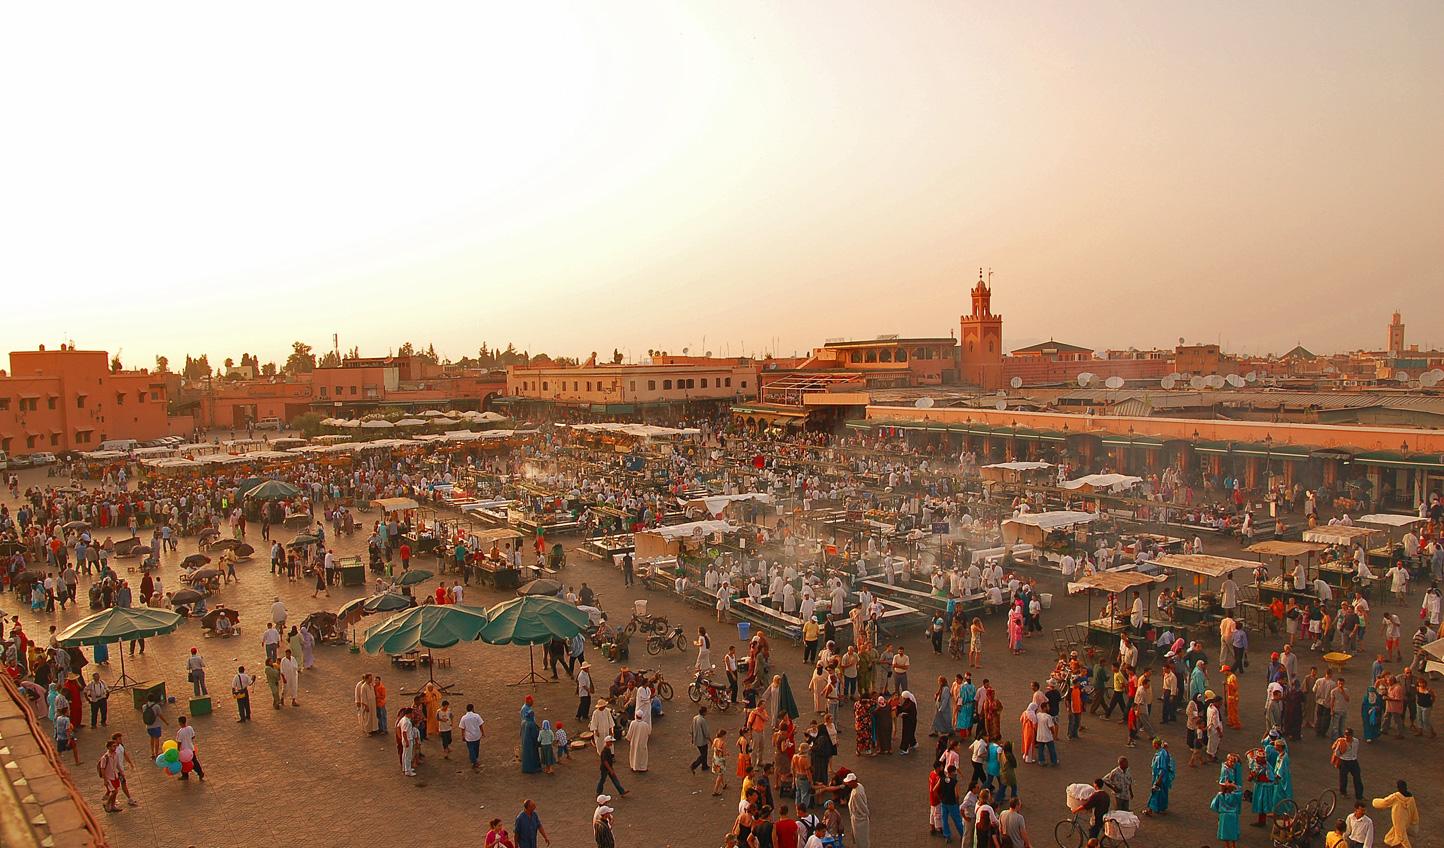 Explore the bustle of Marrakech's Jemaa el Fna